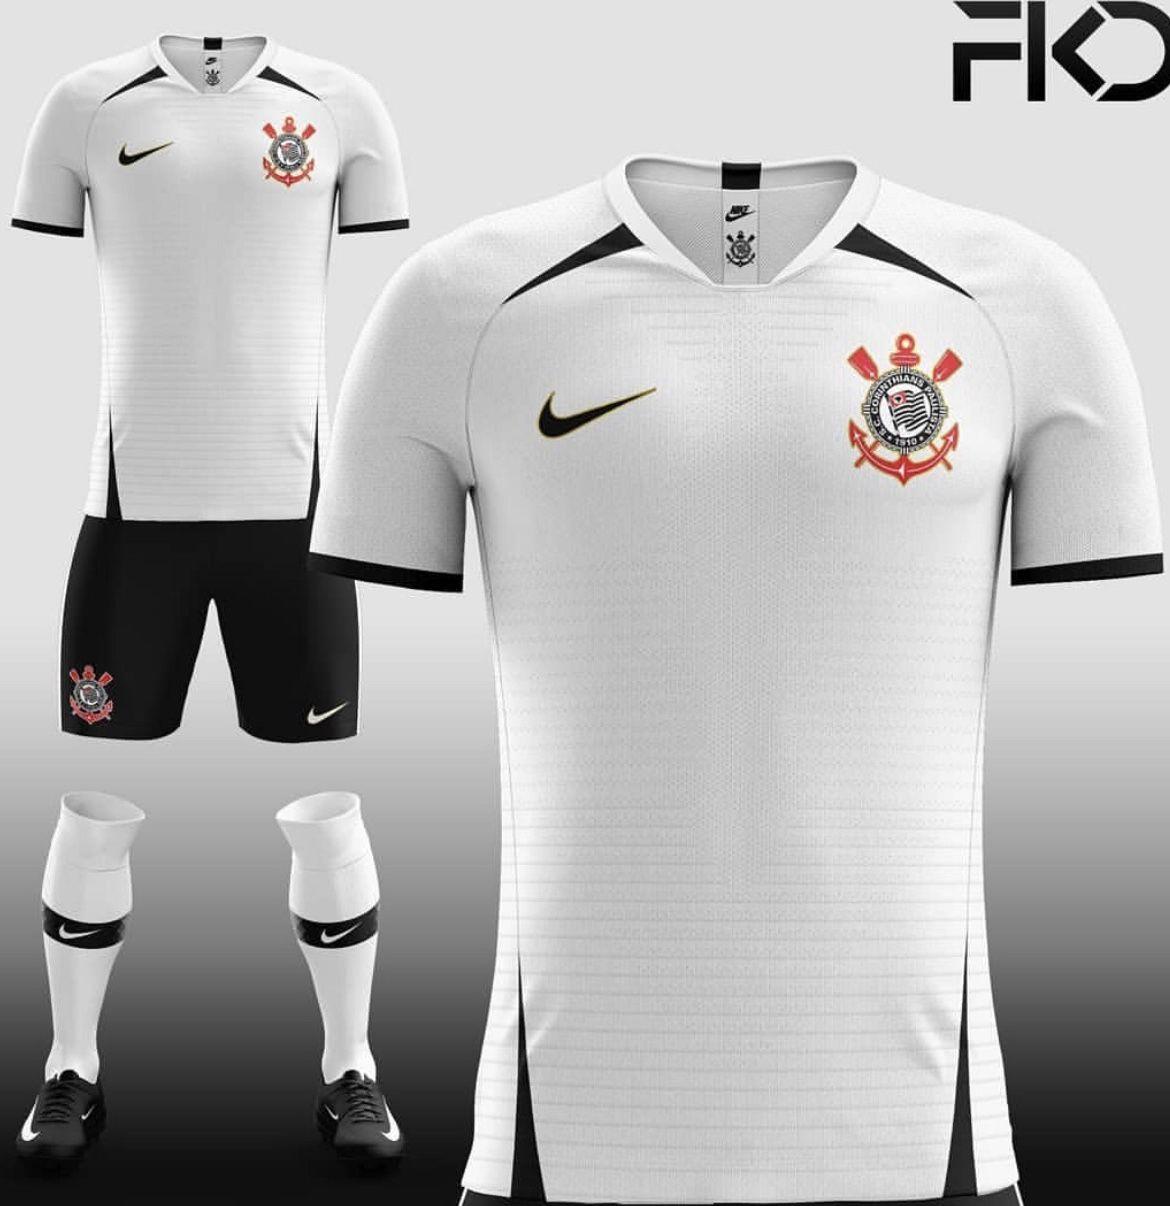 Pin De Lton Studio Em Mockup Camisetas Uniformes Futebol